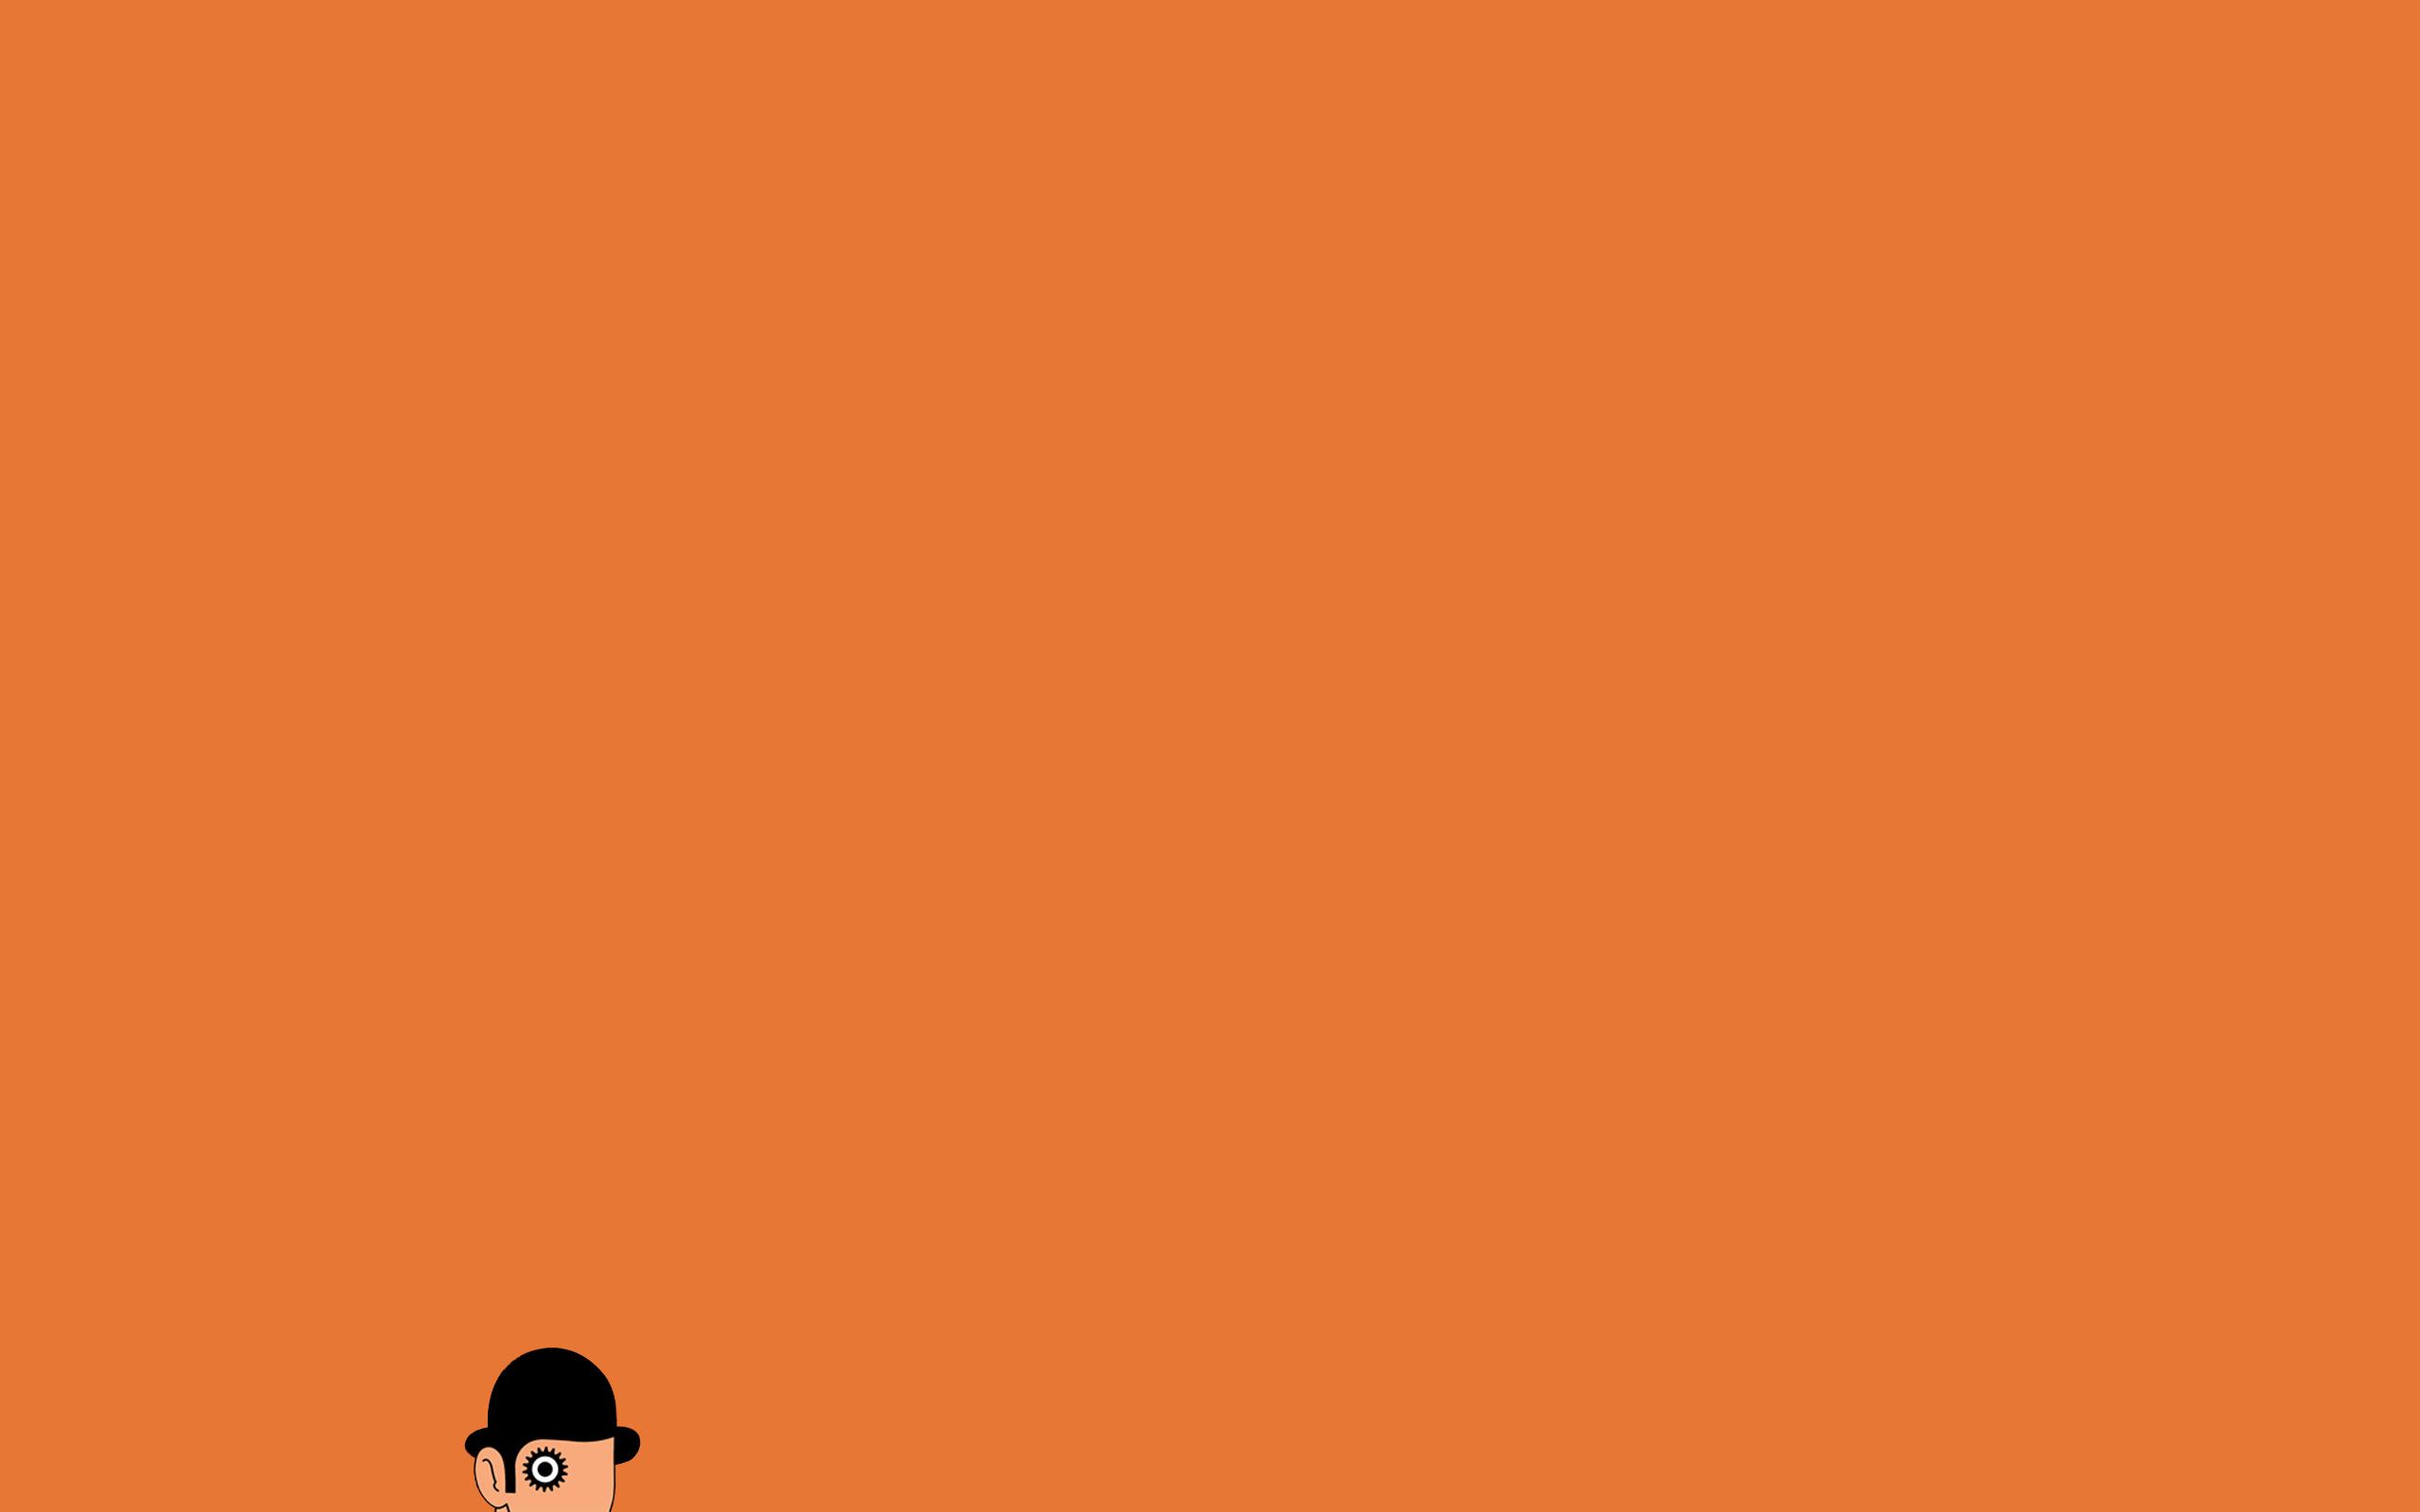 A Clockwork Orange A Clockwork Orange Wallpaper 27633067 Fanpop